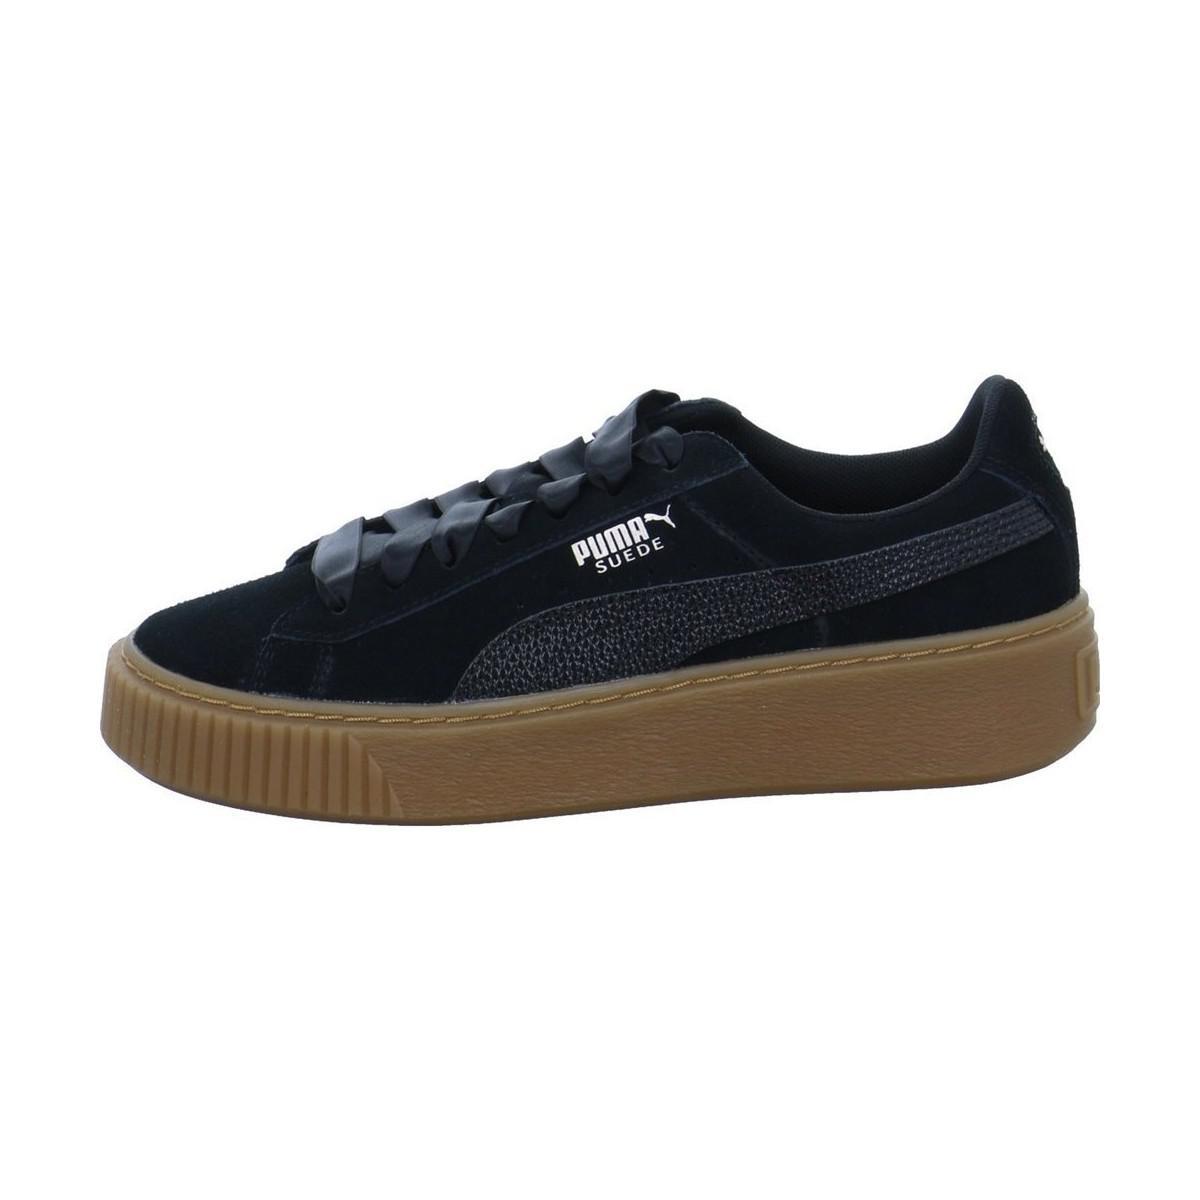 13c423c8620e38 Puma Suede Platform Bubble Wns Women s Shoes (trainers) In Black in ...